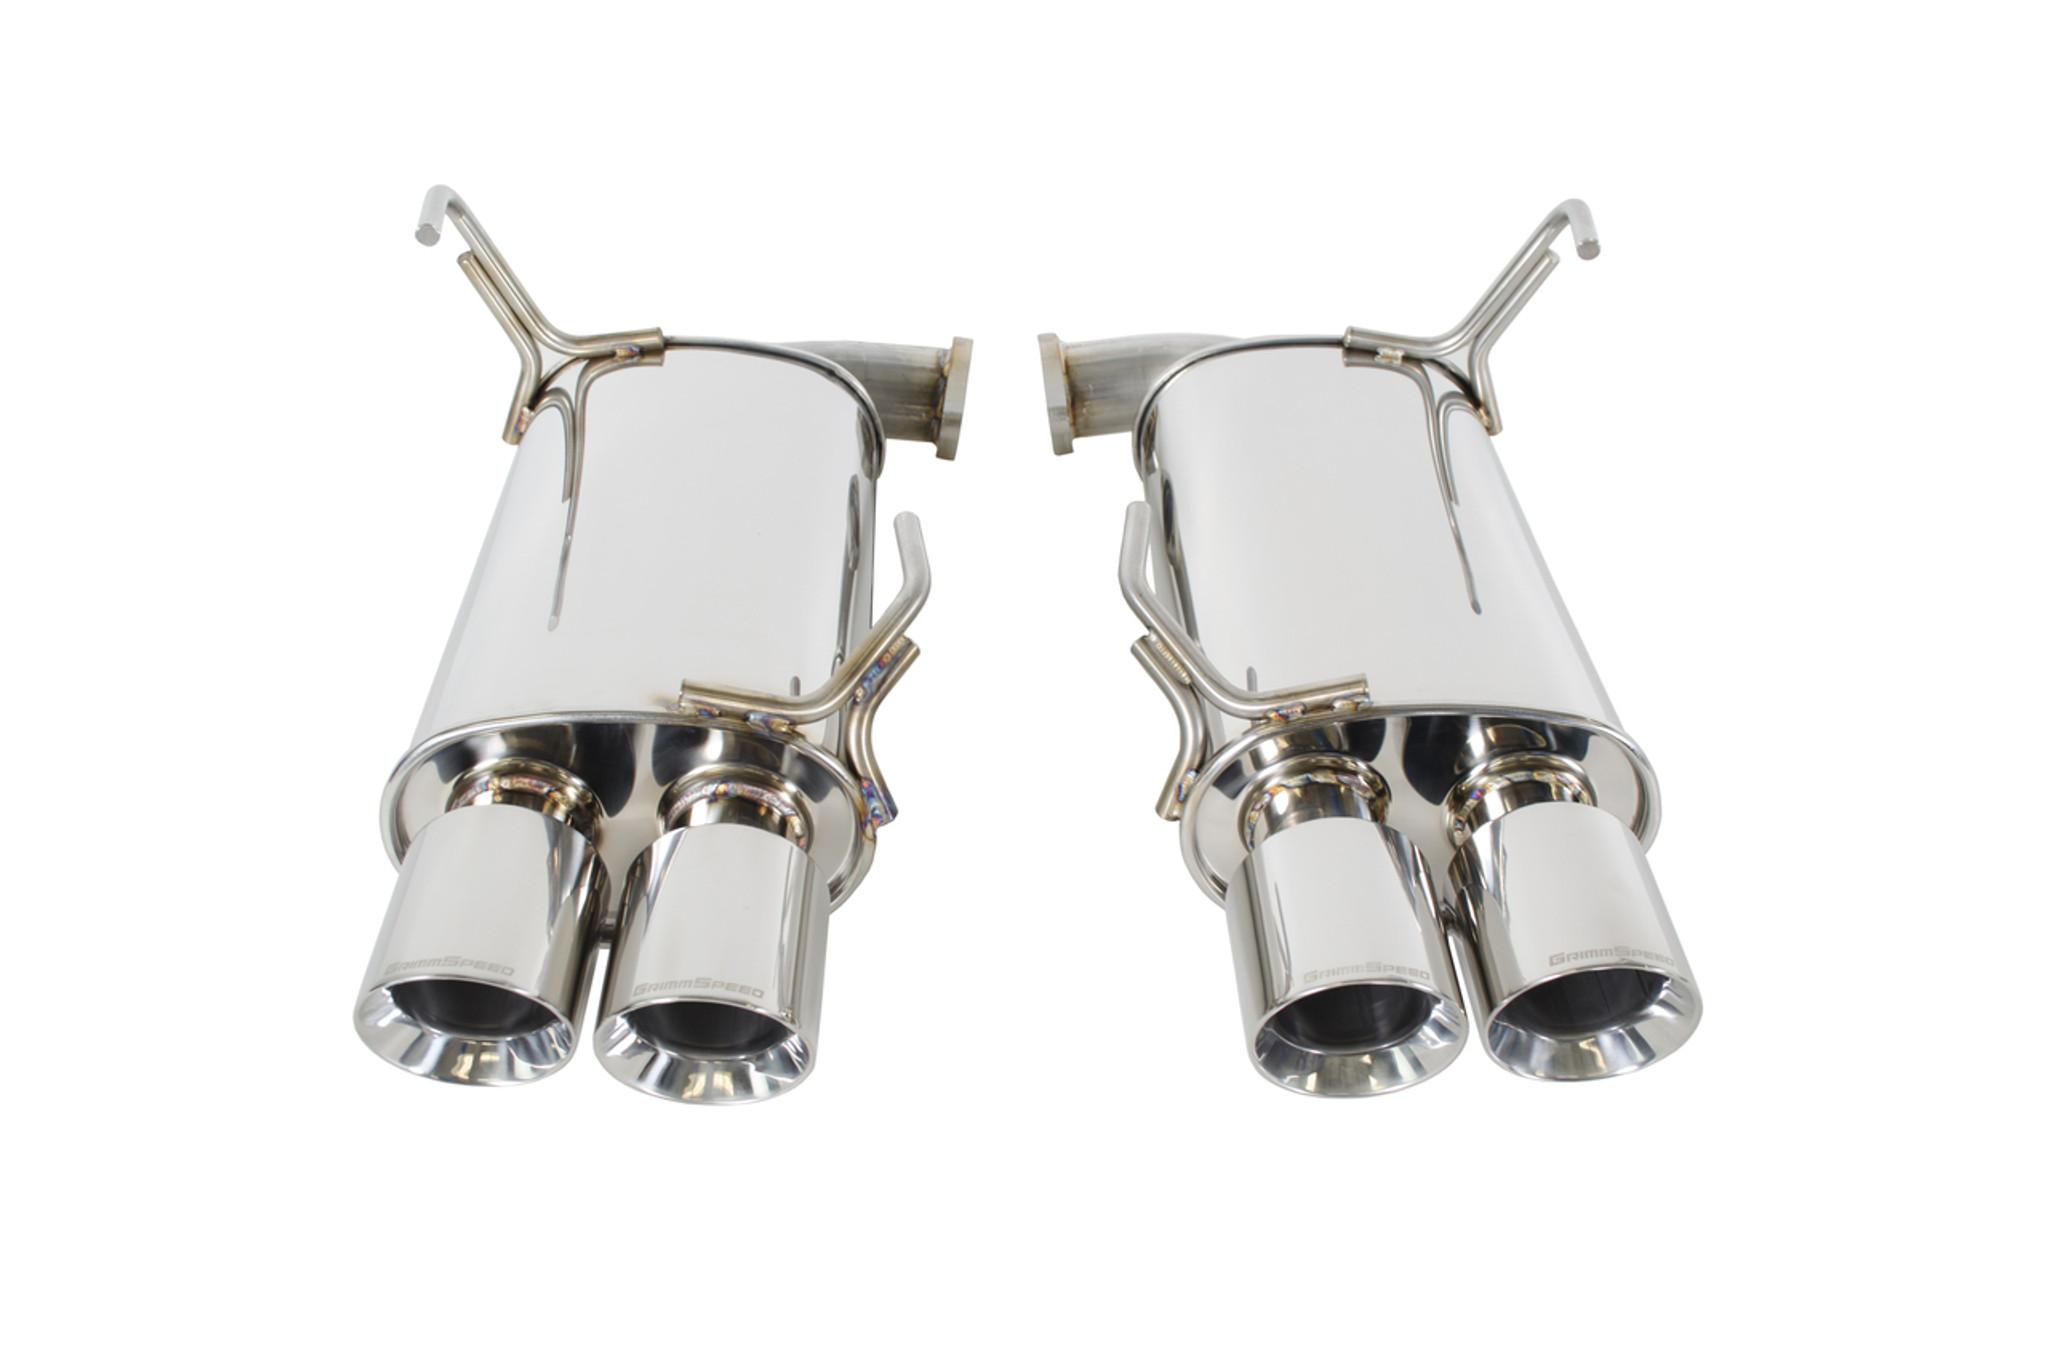 Catback Exhaust System - Resonated - 11-19 WRX/STI Sedan